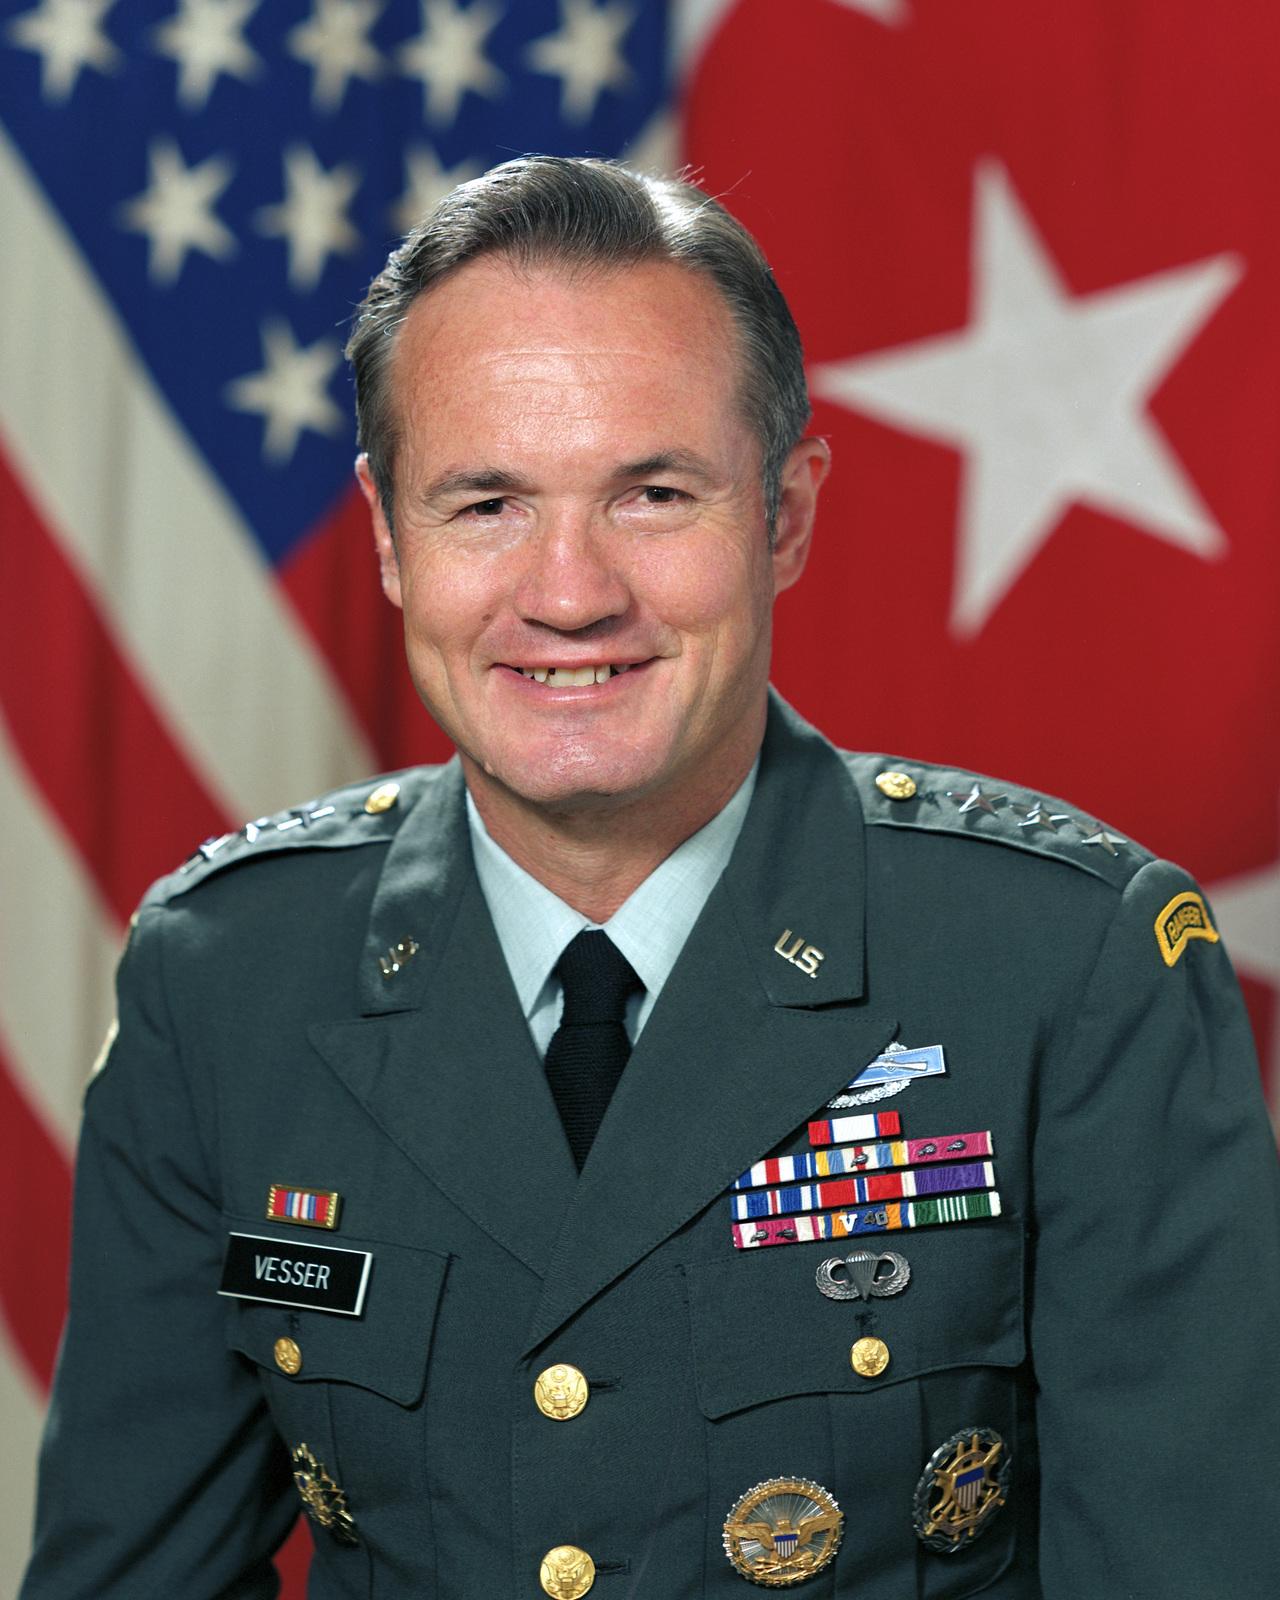 Gjrls army general dick black indonesian chick